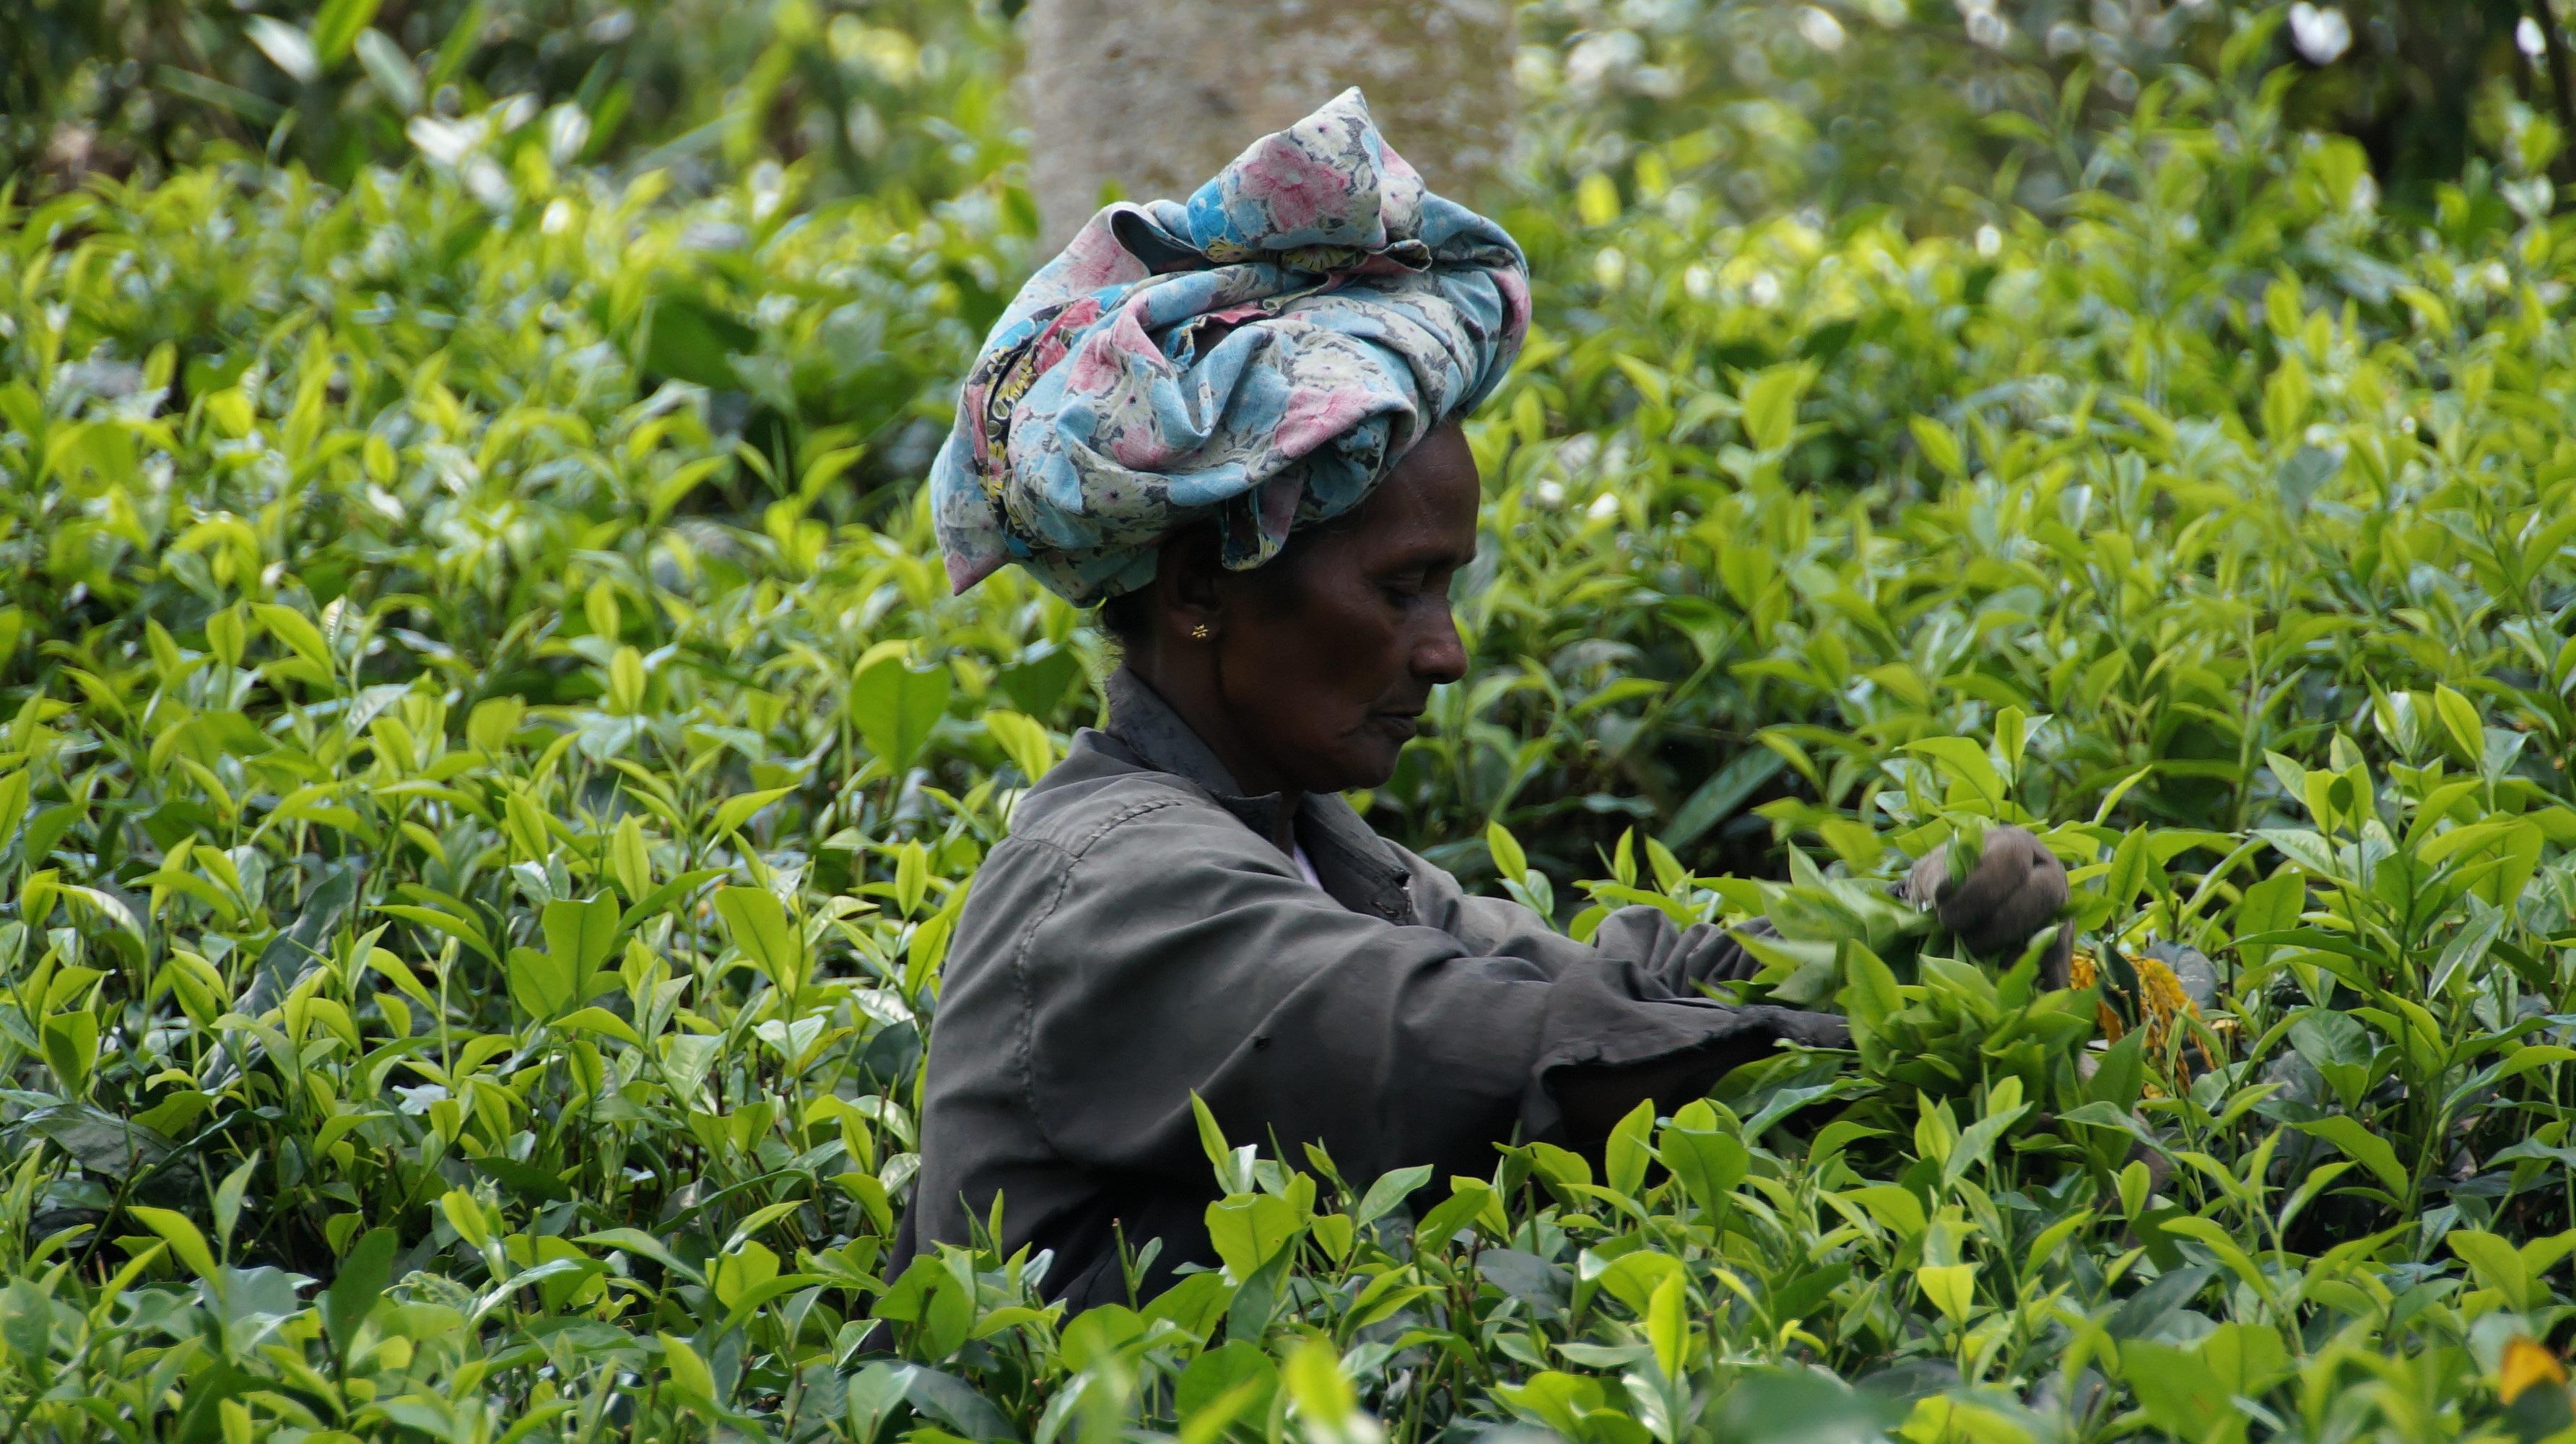 Atividades da agricultura extensiva no meio rural